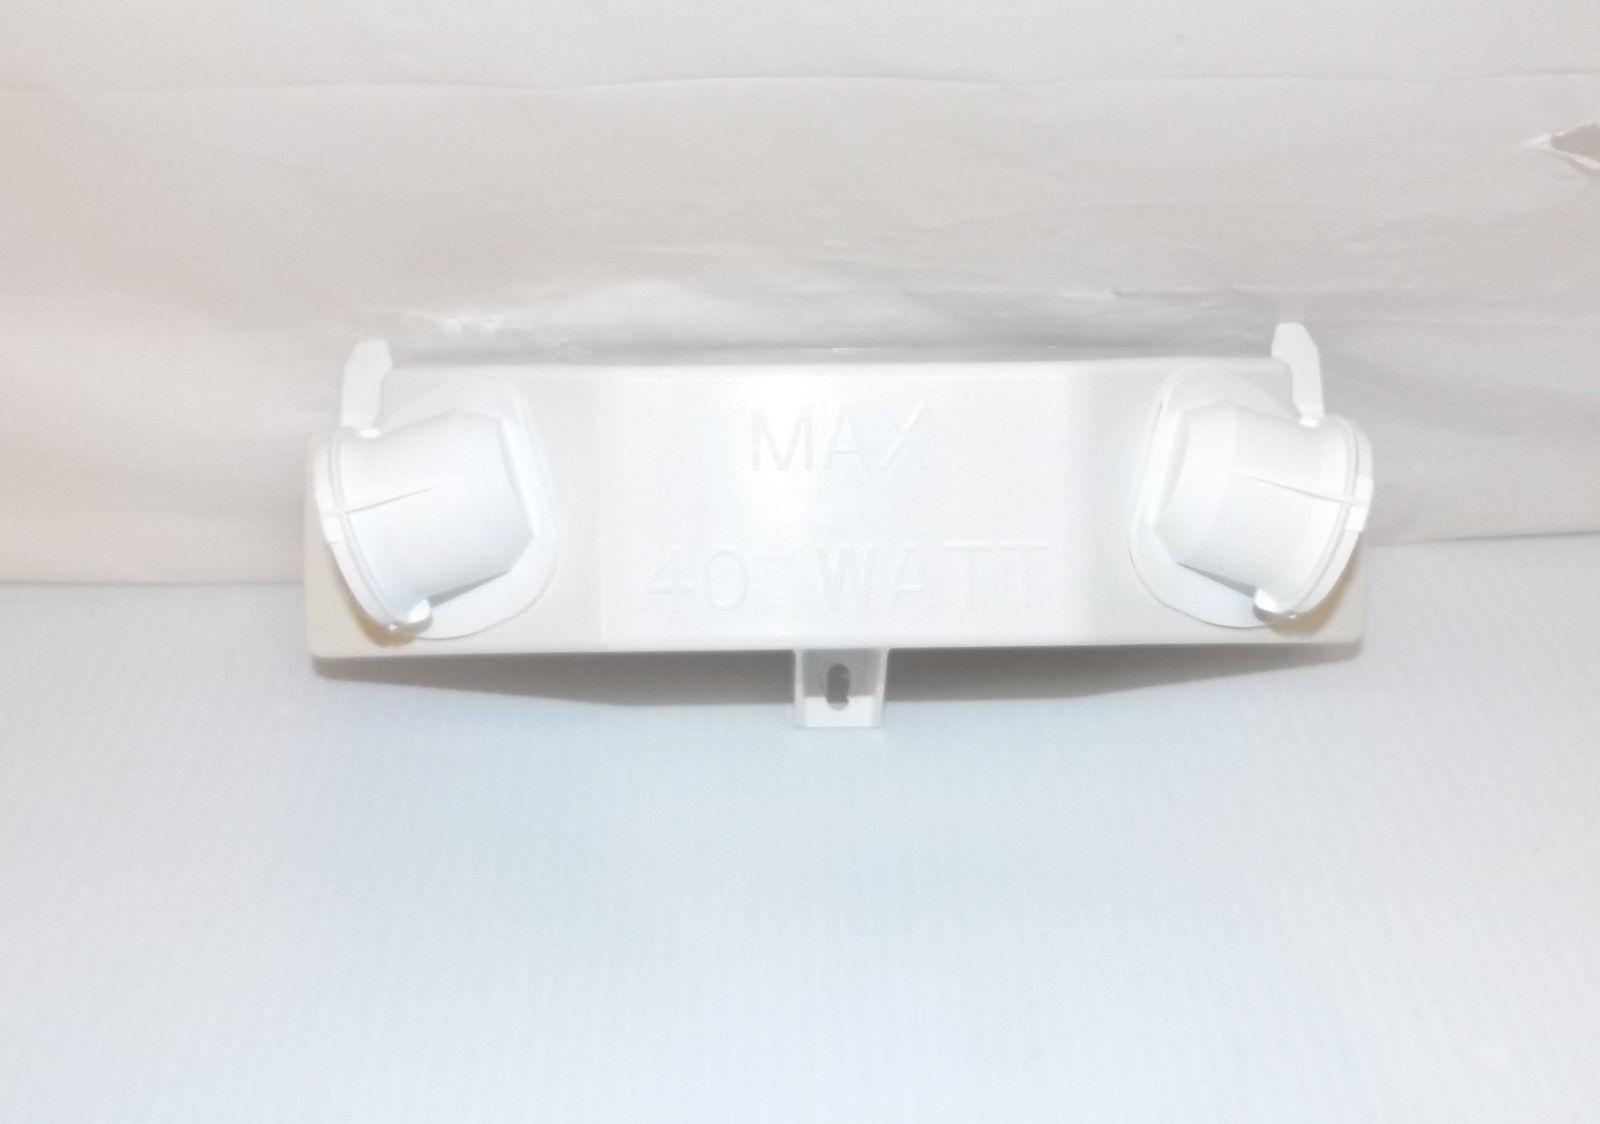 Sears Kenmore Refrigerator : Crisper Dual Light Assembly (2256035) {P1580} - $11.87